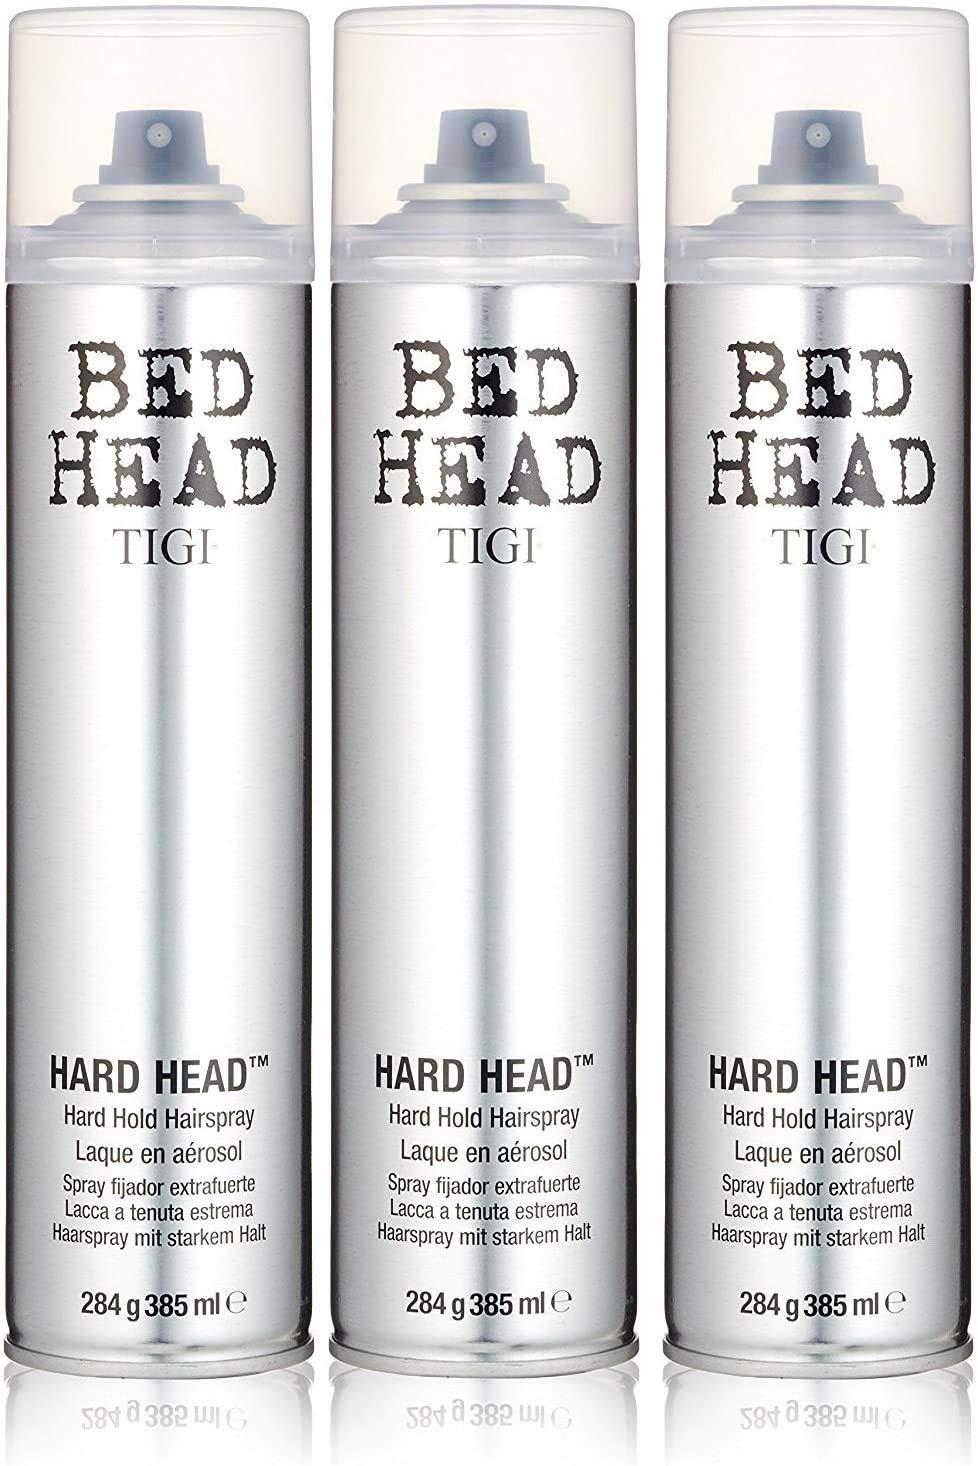 Tigi Bed Head Hard Head Spray 10.6 Oz Each (Pack of 3)